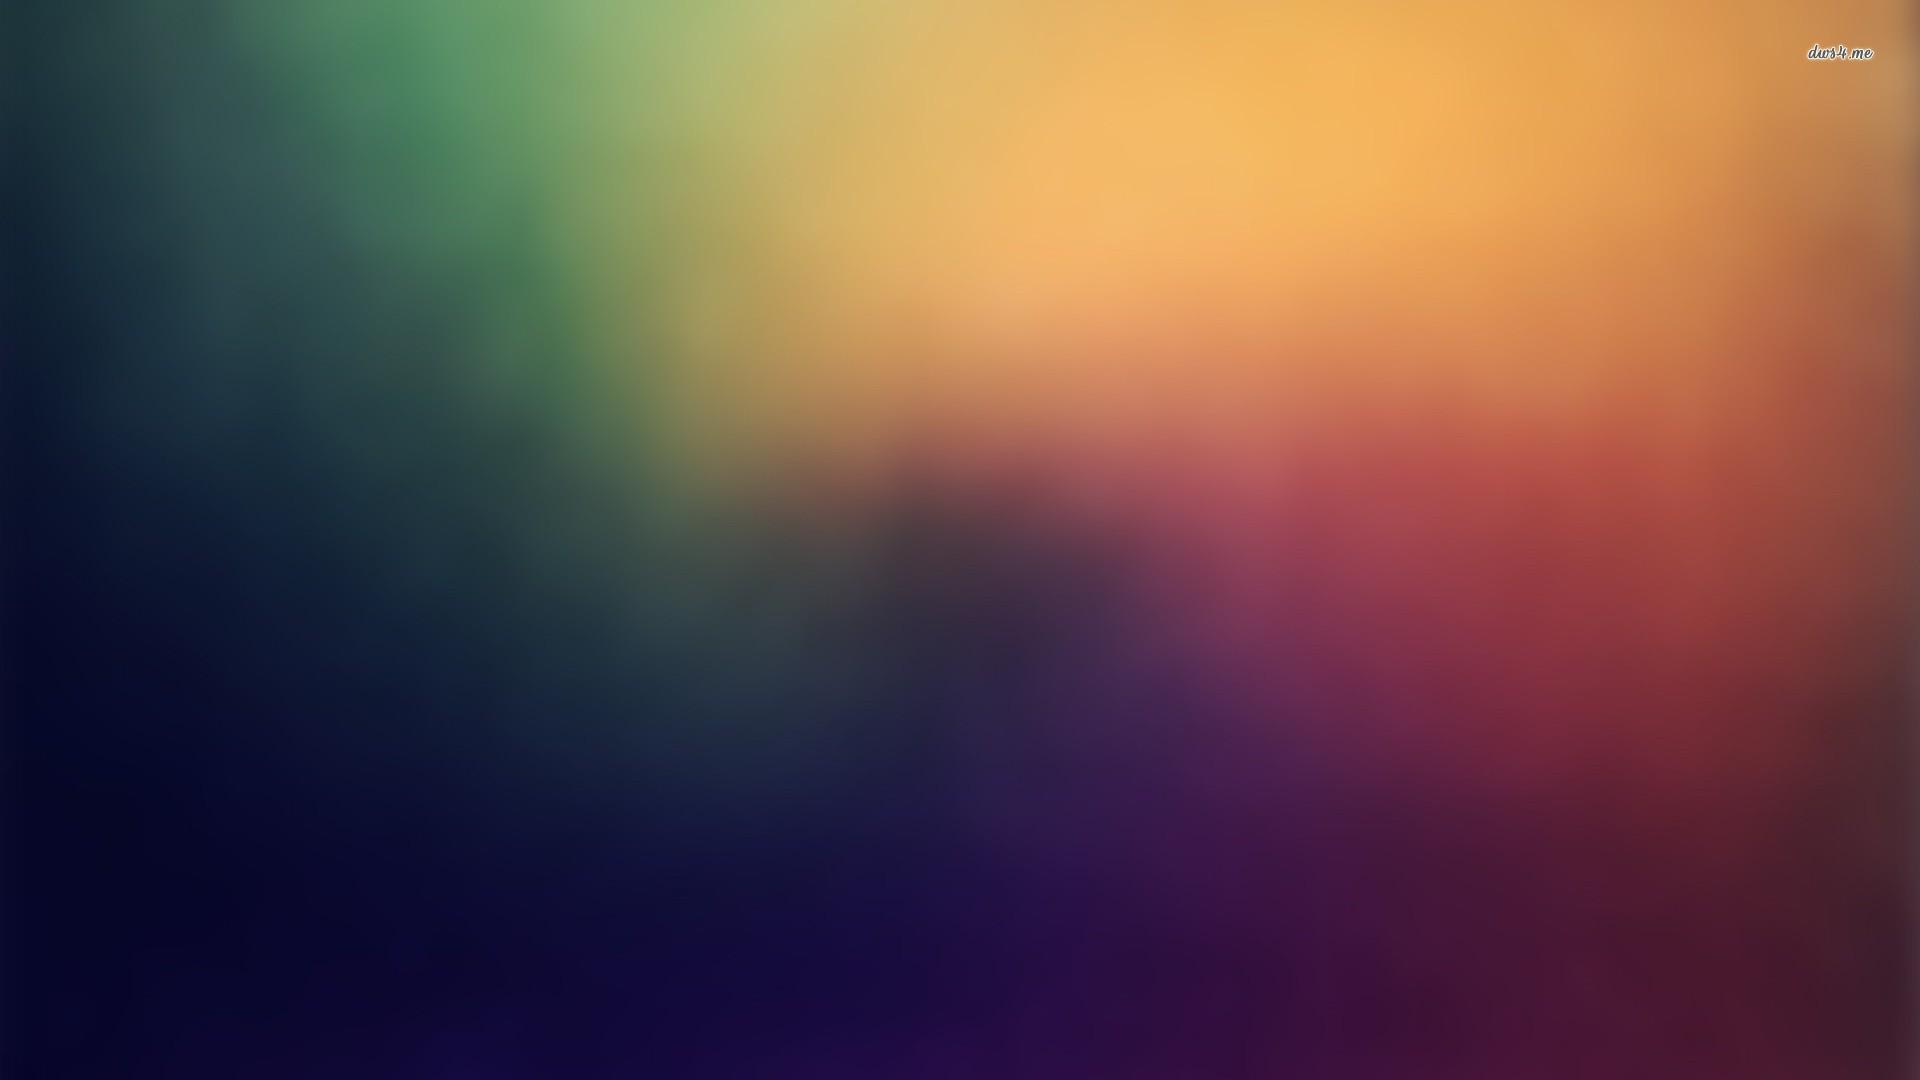 Download Pink Gradient Tumblr Wallpaper 1920x1080 76 Wallpaper